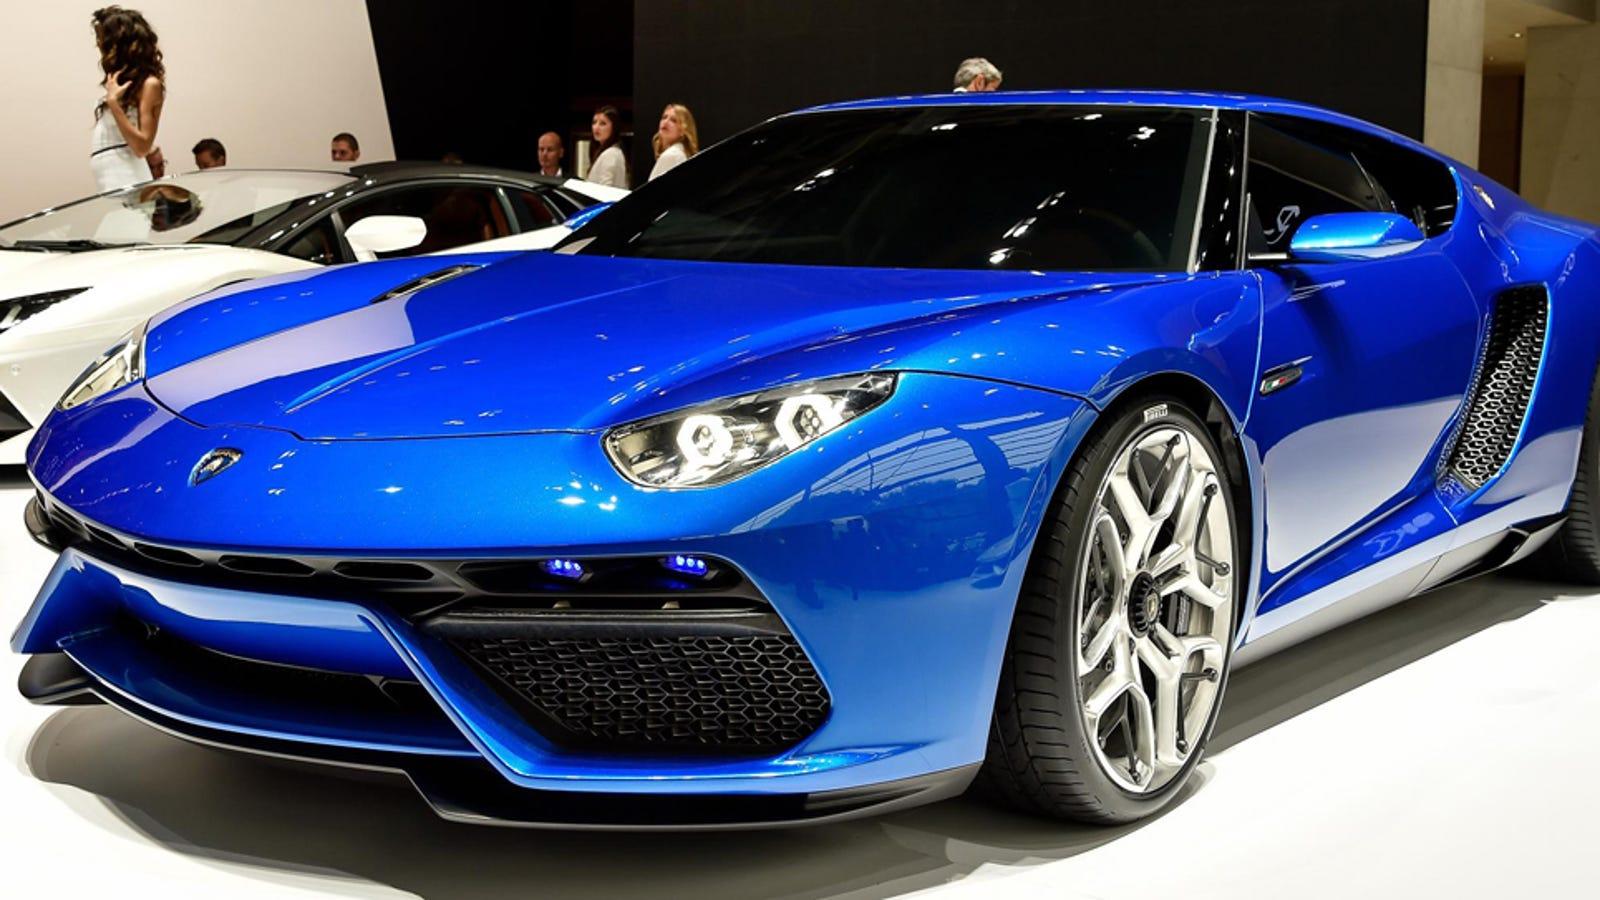 The Asterion Moves Lamborghini Into A Beautiful High Tech Future